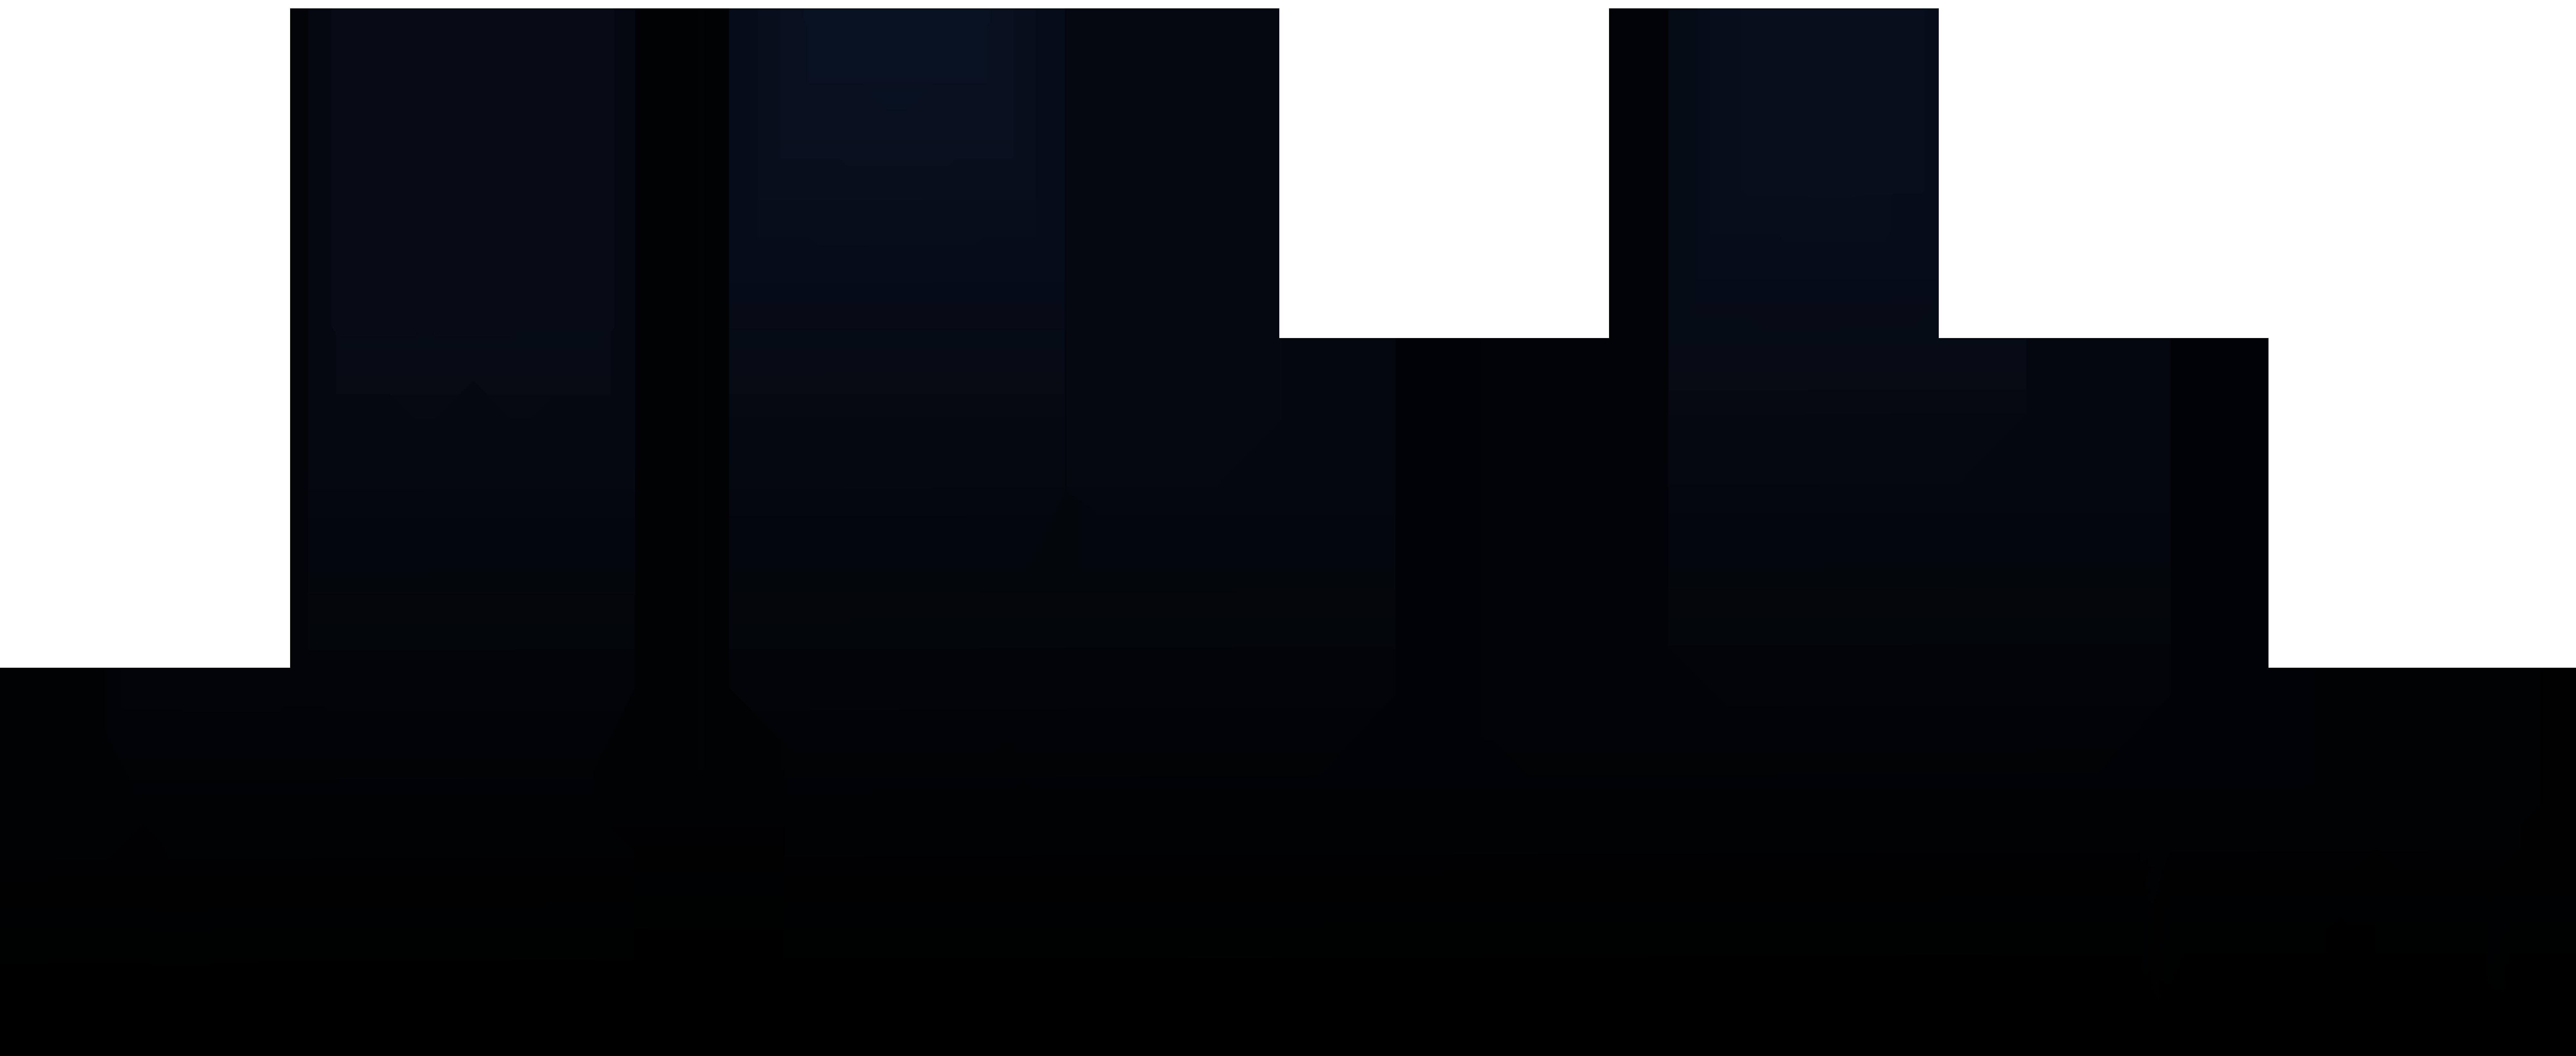 City silhouette png clip. Egypt clipart skyline